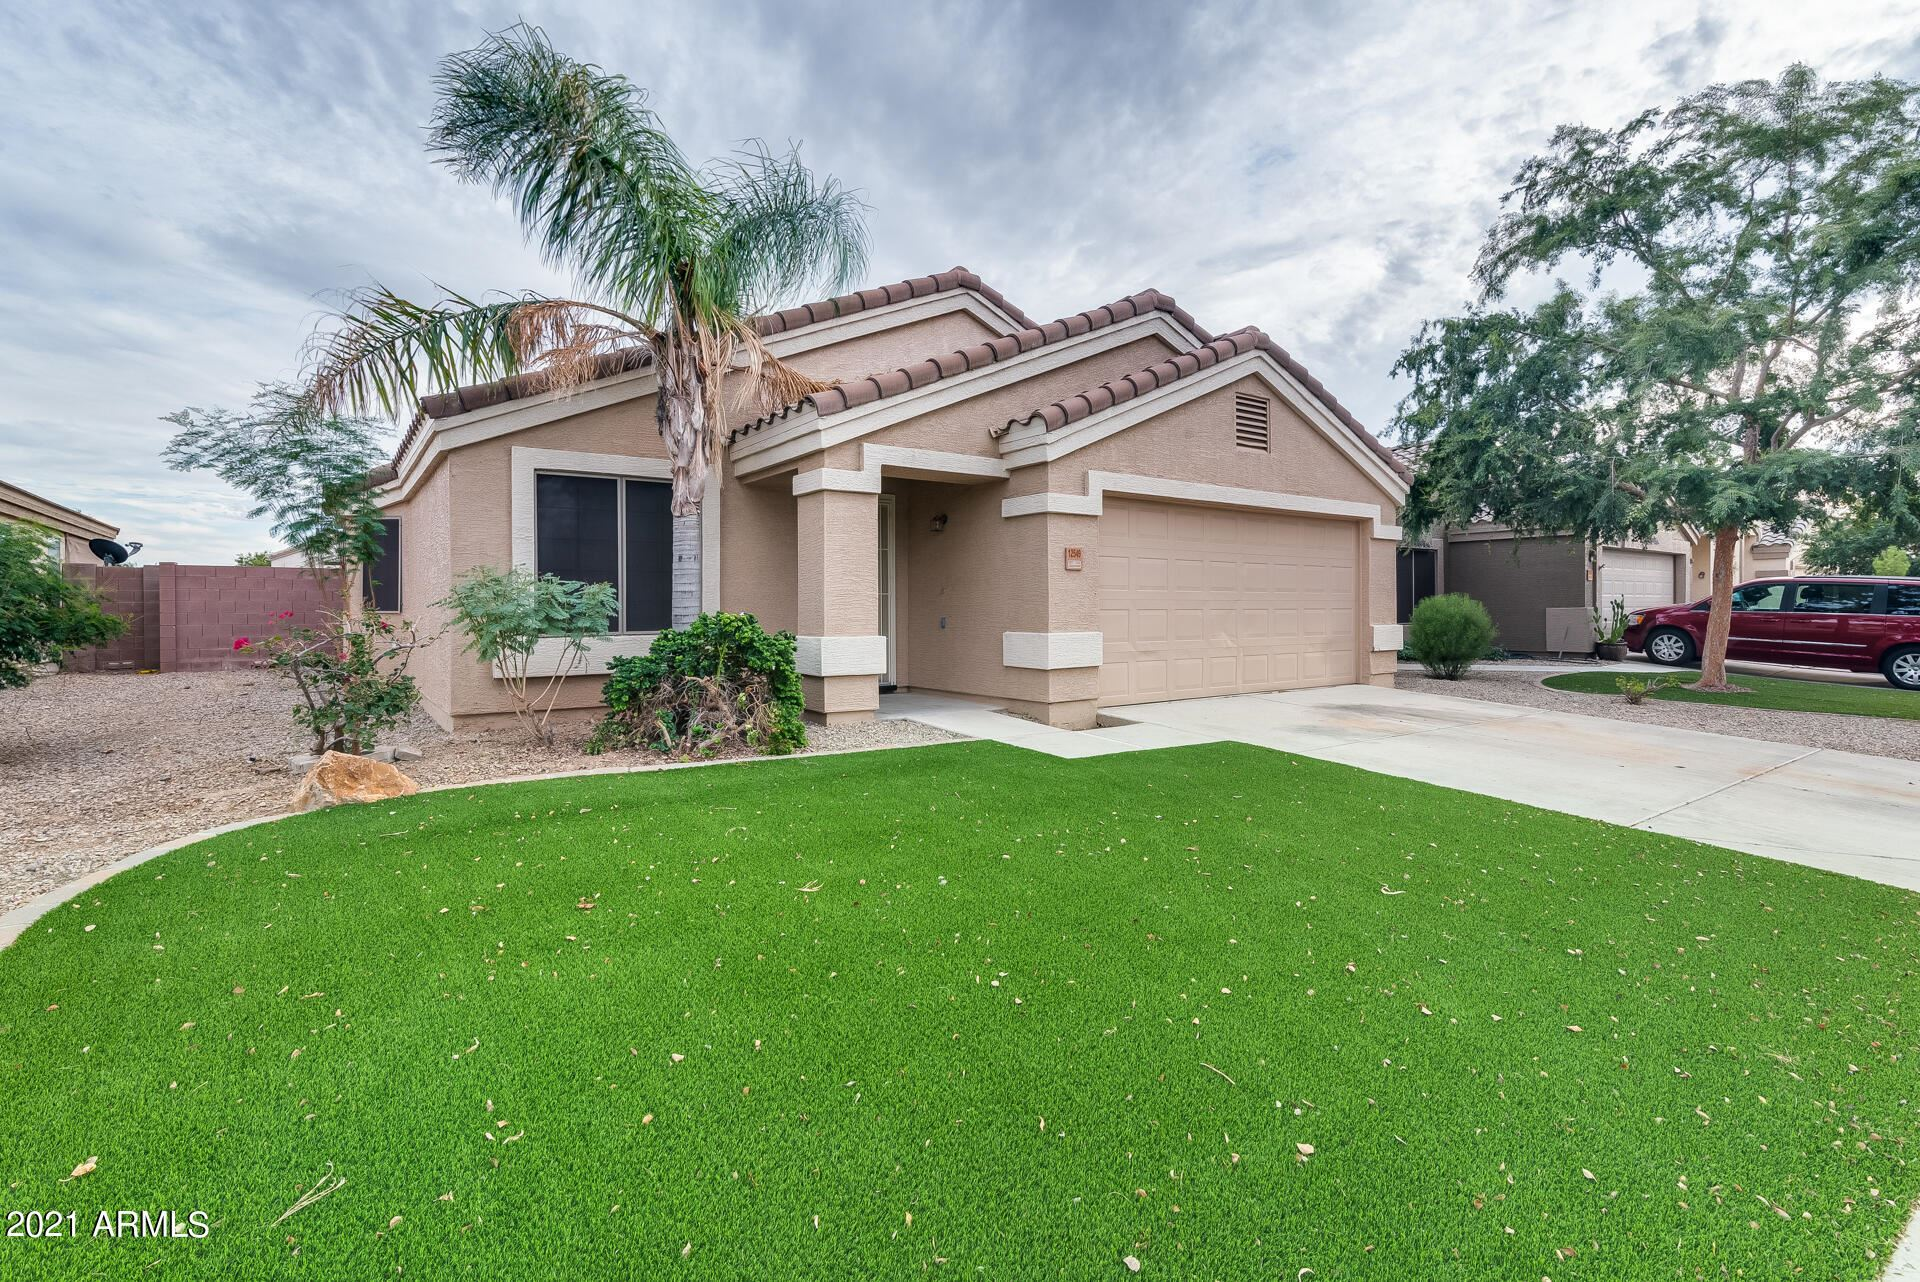 Photo of 12549 W VIA CAMILLE Drive, El Mirage, AZ 85335 (MLS # 6299950)